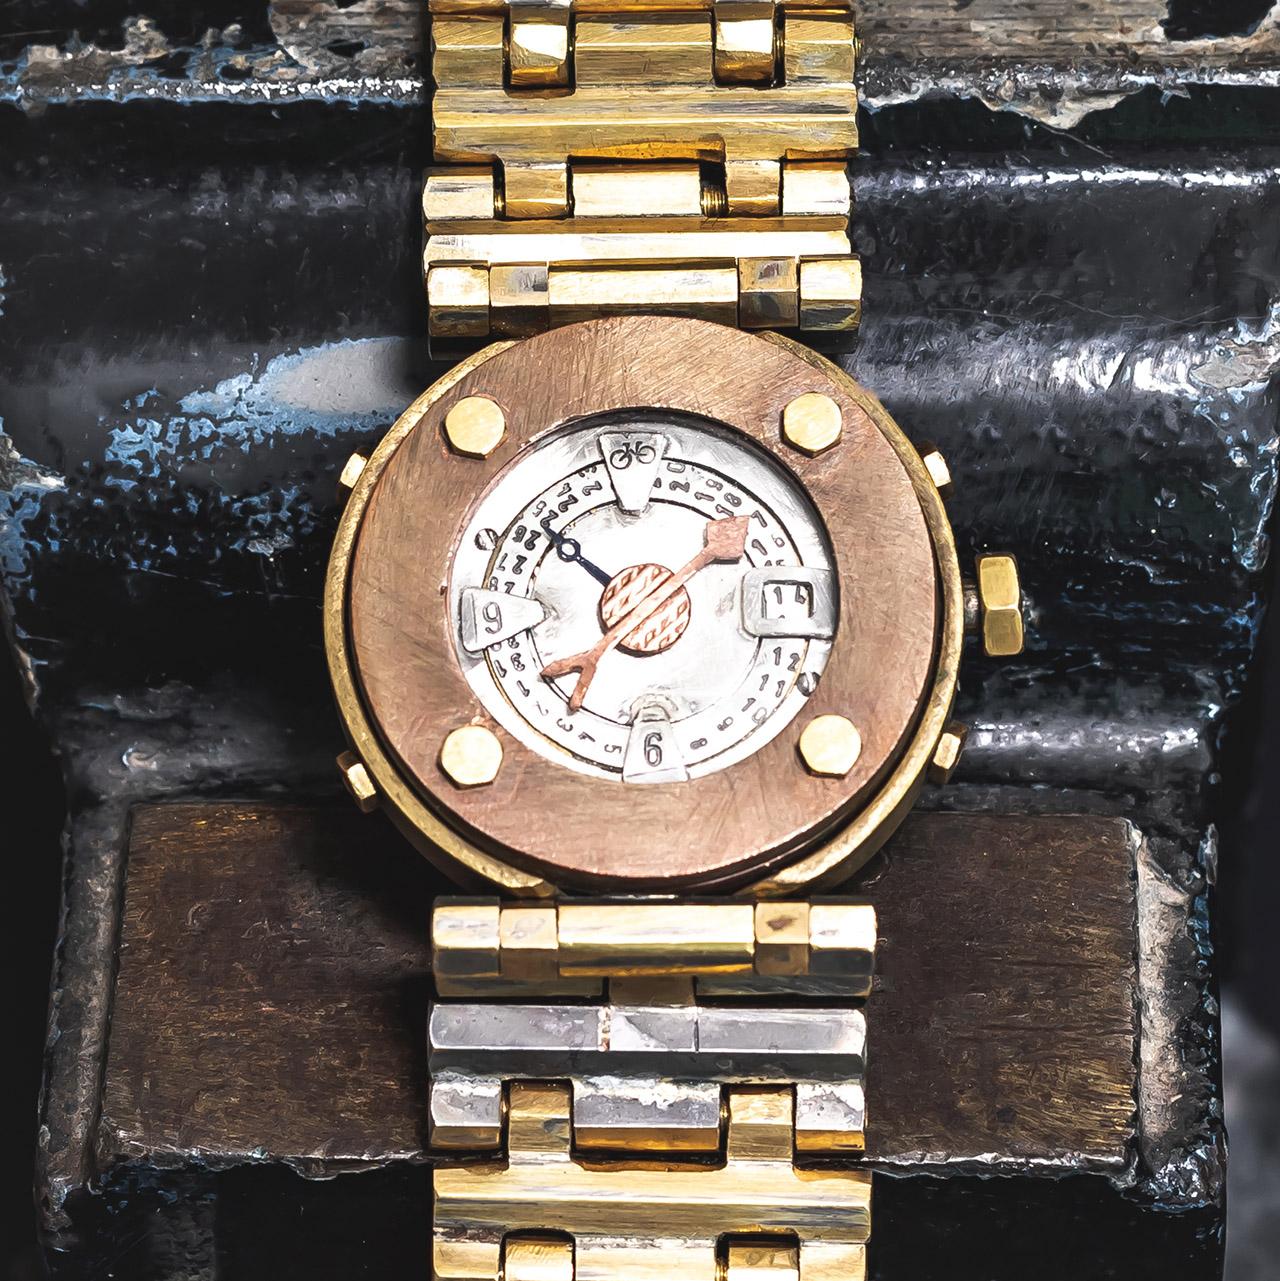 Armbanduhr anfertigen lassen - Atelier Horloges - Uhr mit Flügeln - Roulette